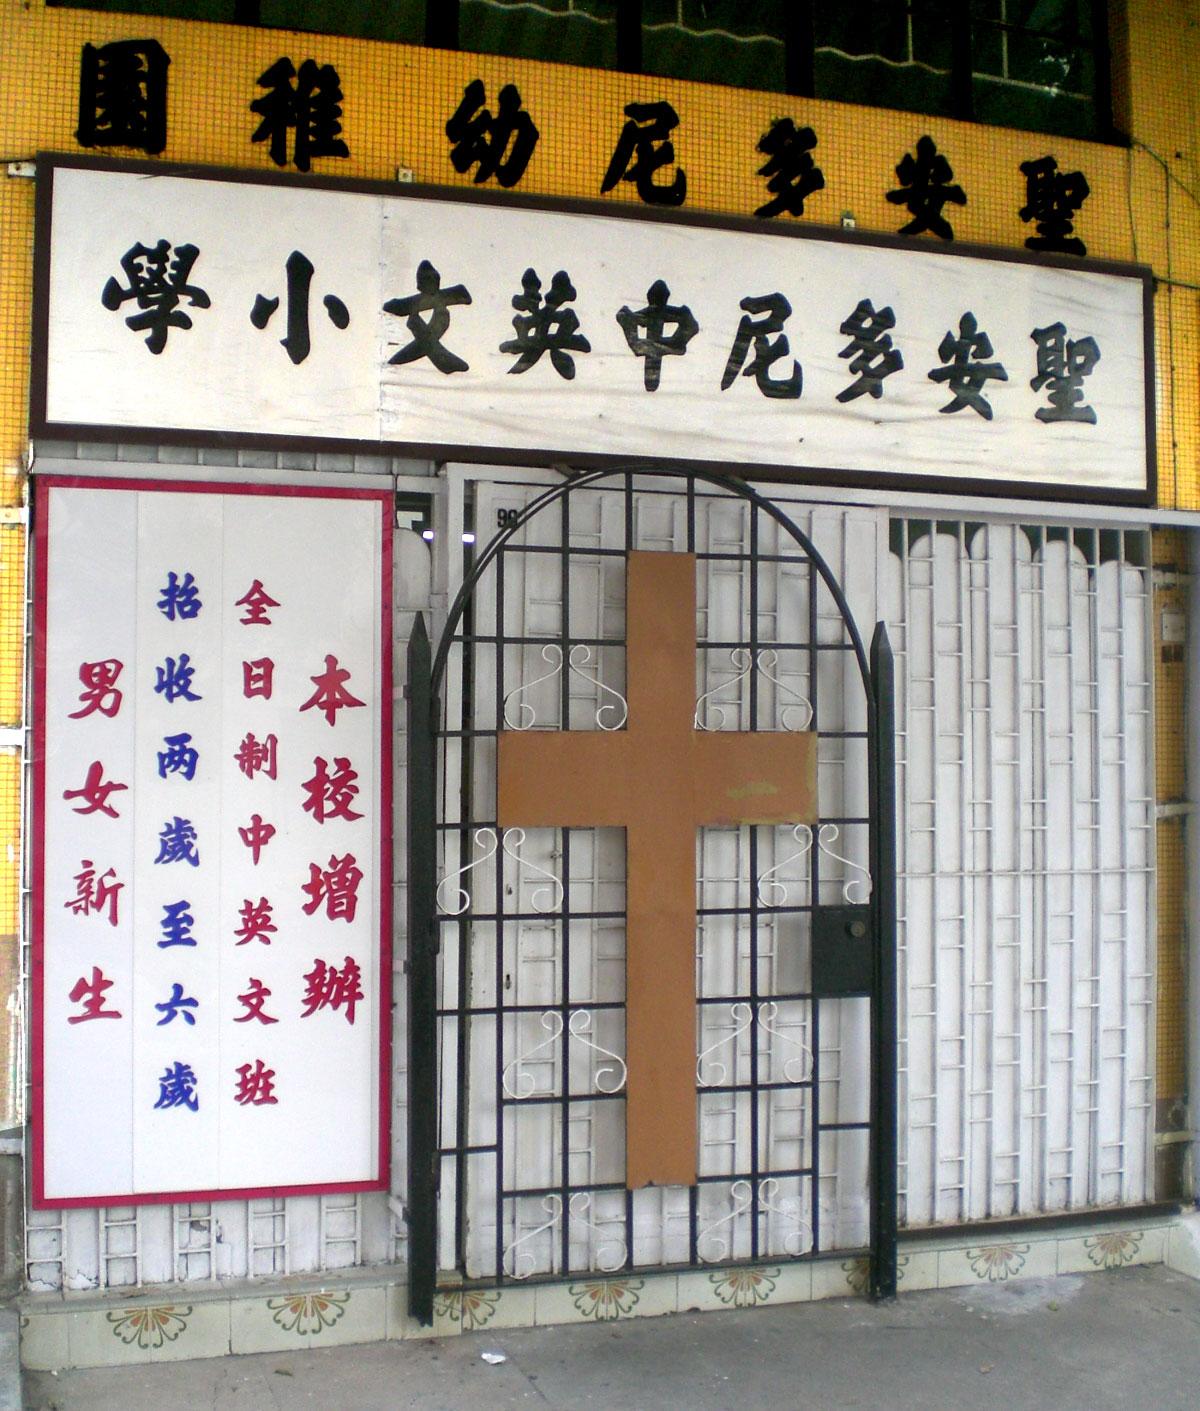 File:HK Hill Road St Anthony's Anglo Chinese Kindergarten 聖安多尼中英文小學暨幼稚園 1 a.jpg - 維基百科,自由的百科全書